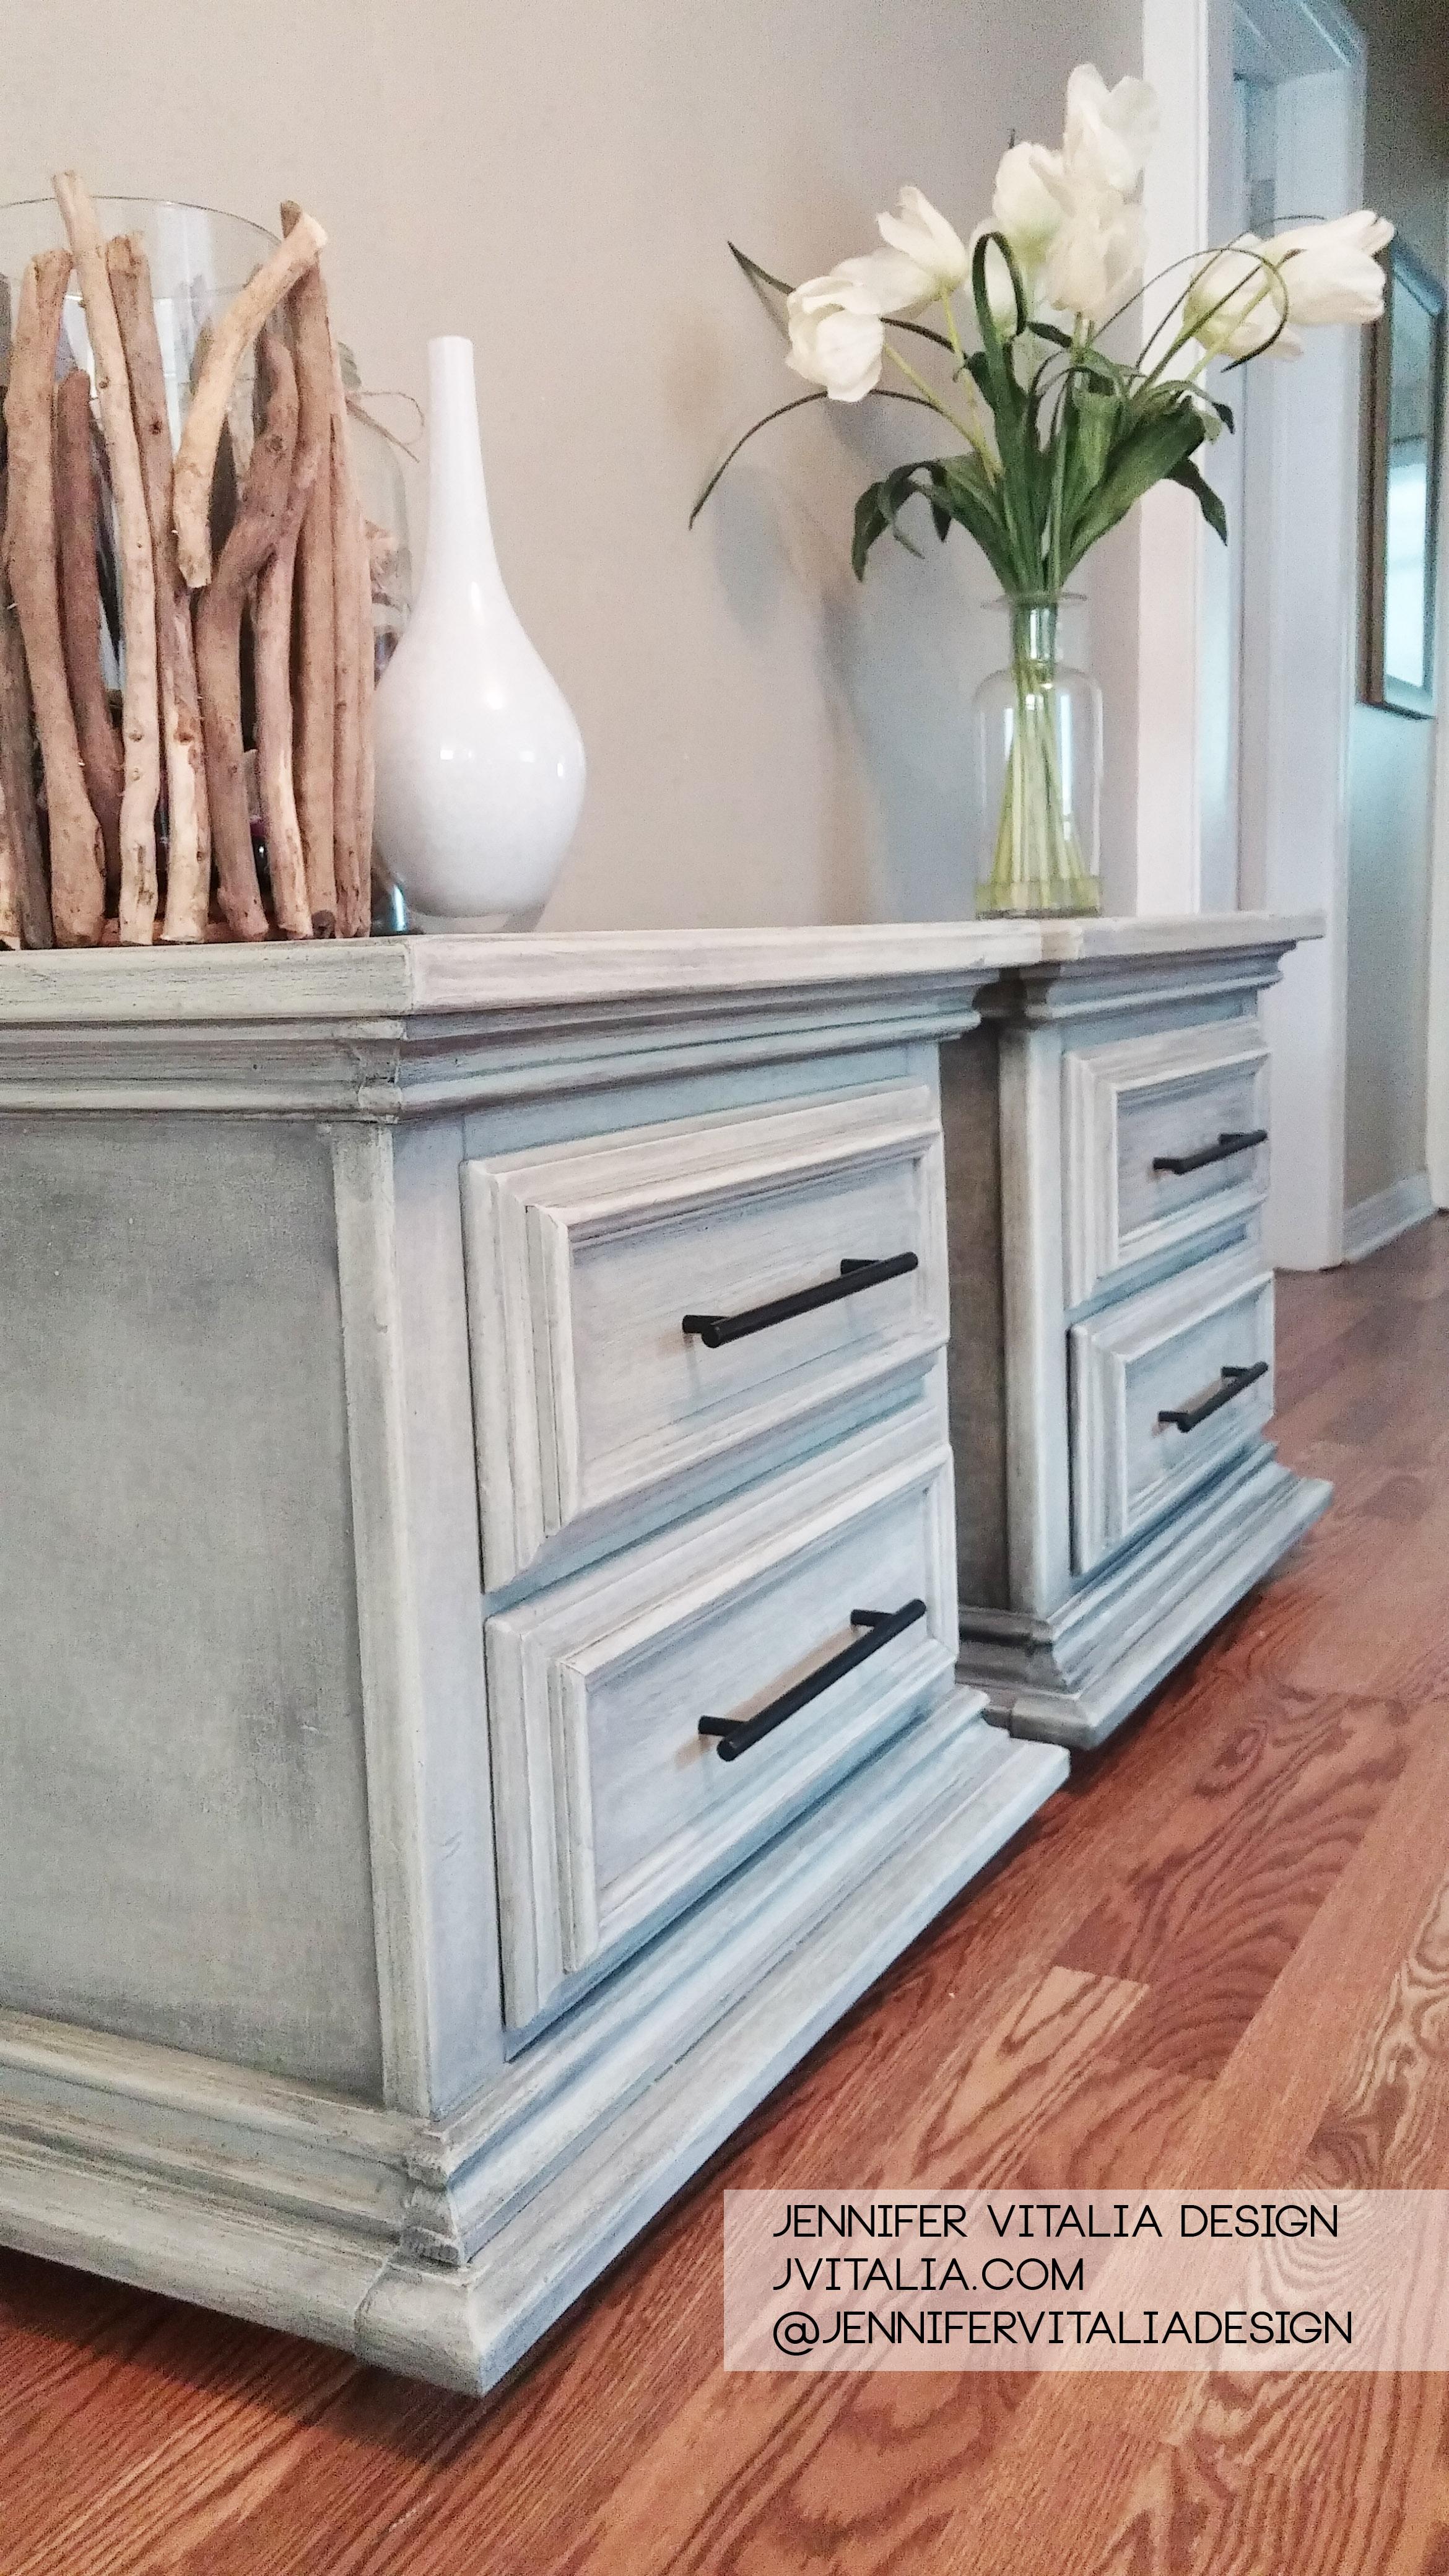 jennifer vitalia design painted furniture nj